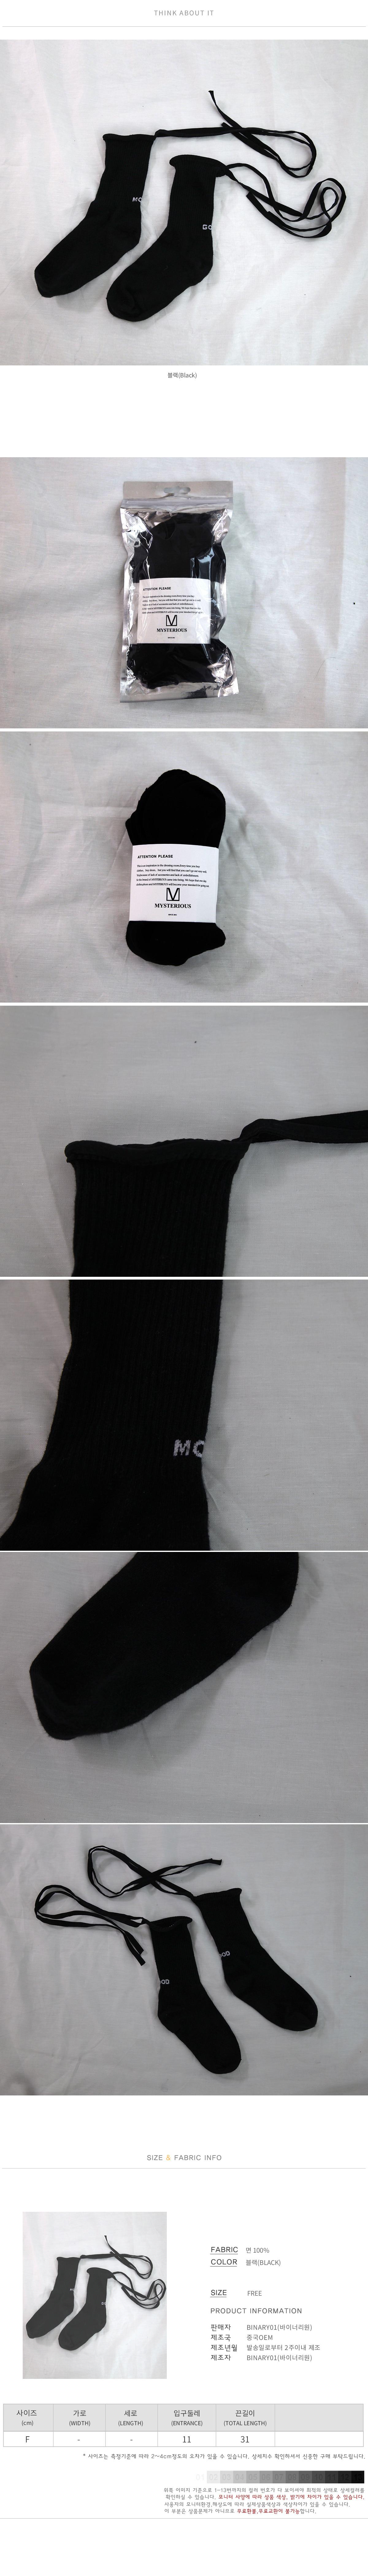 Ribbon monnet sox